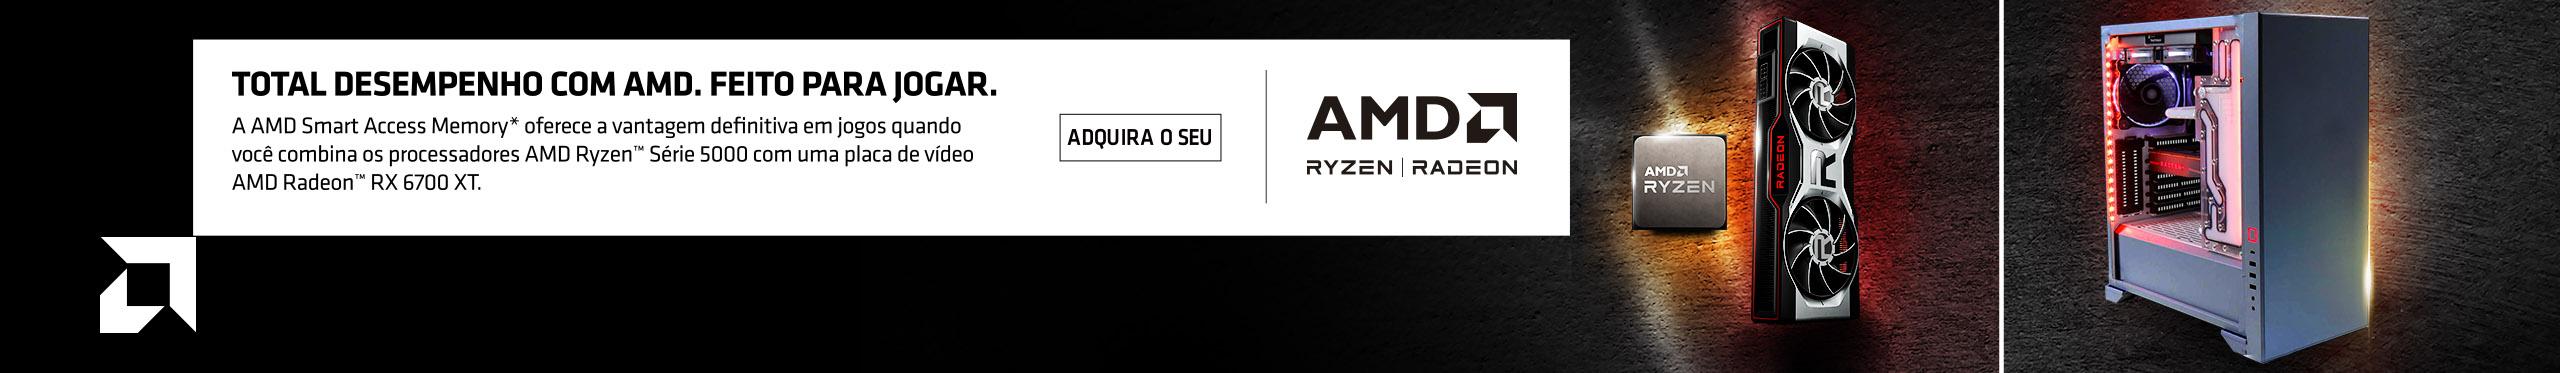 Banner de lançamento AMD Radeon RX 6700 XT